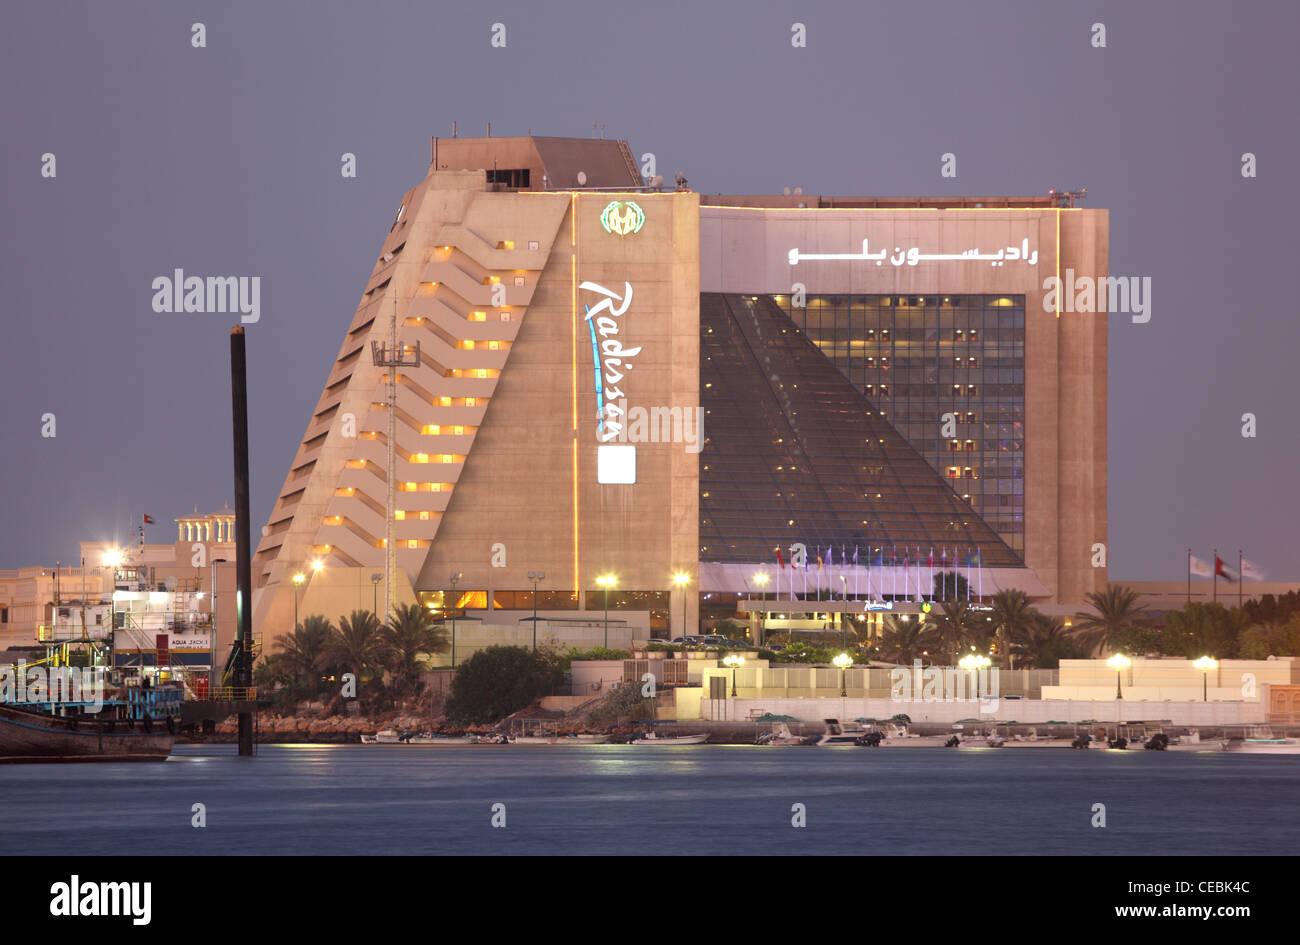 Radisson Hotel in Sharjah, United Arab Emirates - Stock Image